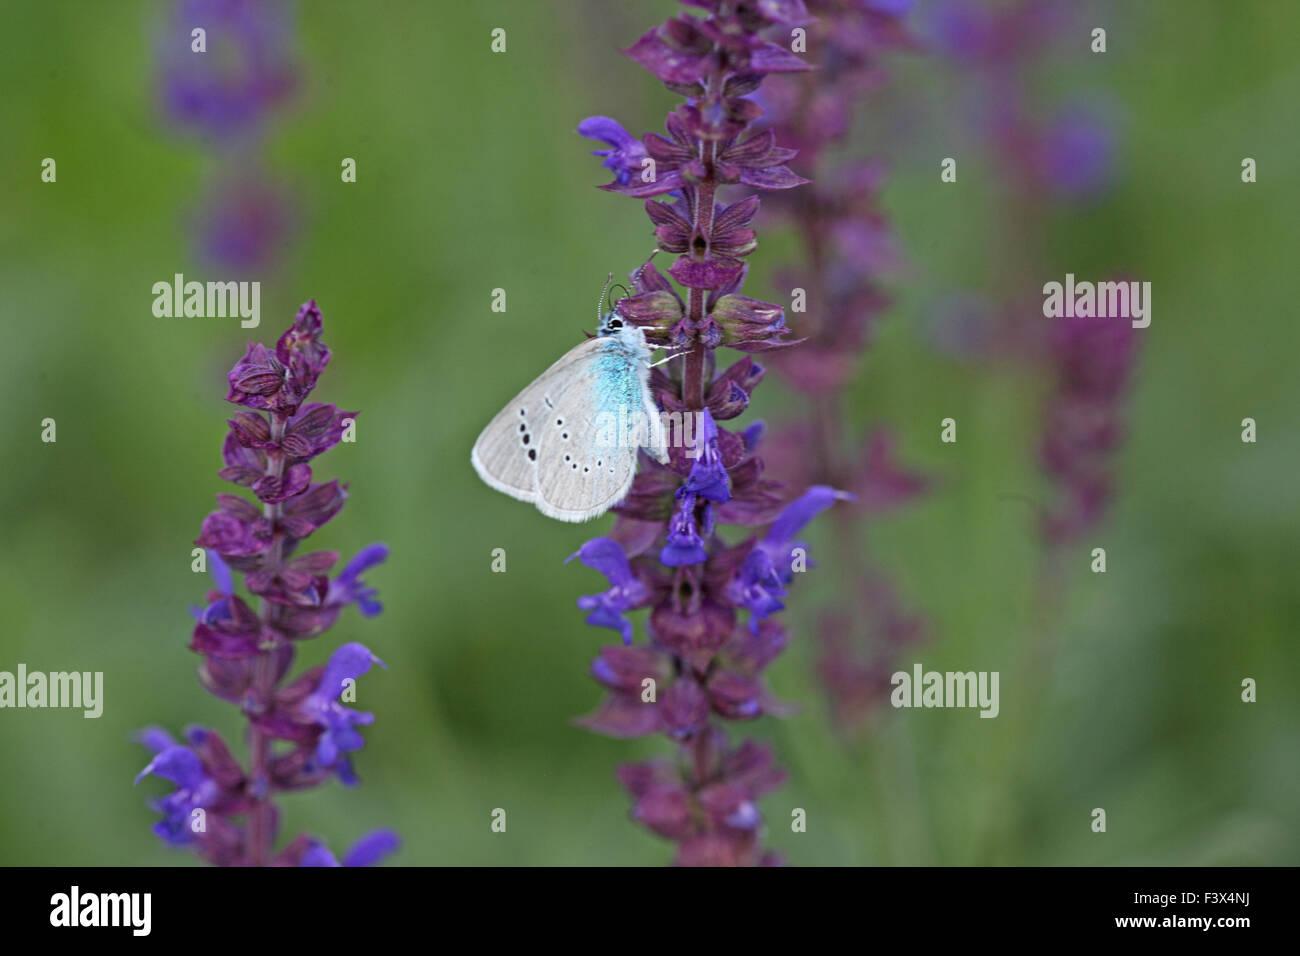 Feeding on wild sage Hungary June 2015 - Stock Image